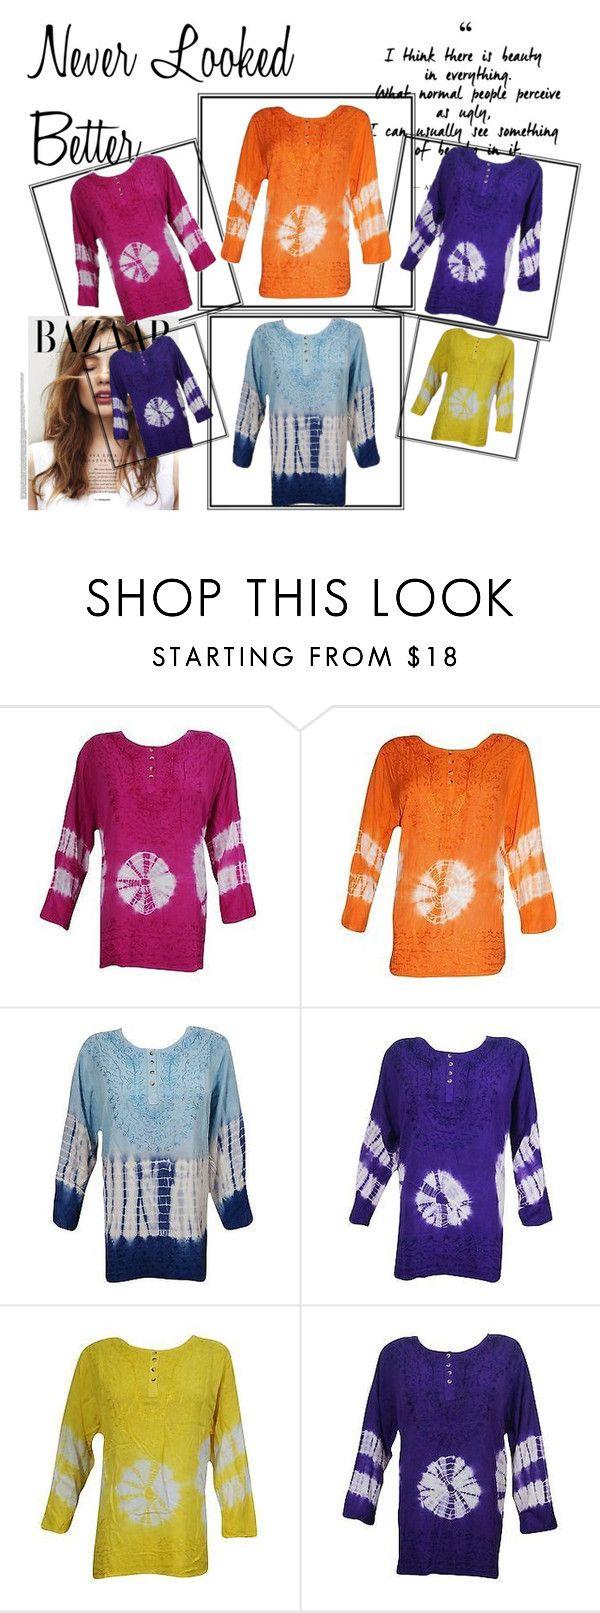 Boho Gypsy Hippie Blouse Tops by baydeals on Polyvore   http://stores.ebay.com/mogulgallery/TOPS-BLOUSES-/_i.html?_fsub=901626119&_sid=3781319&_trksid=p4634.c0.m322